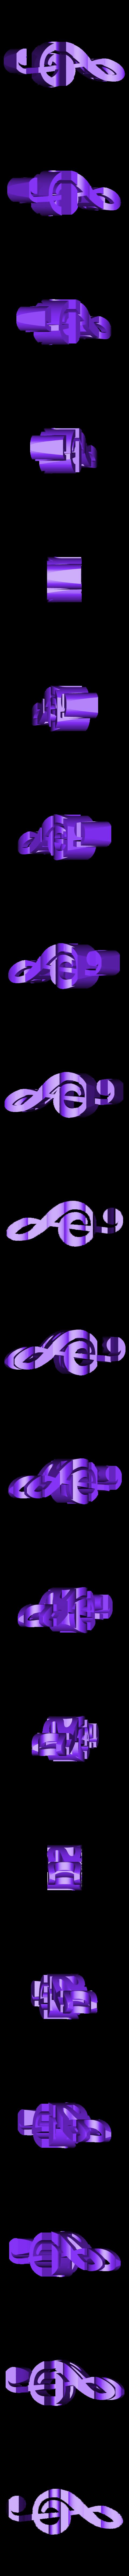 MUSIC.stl Download STL file Text Flip. Music - Treble clef • 3D printer object, mr_printer_bot